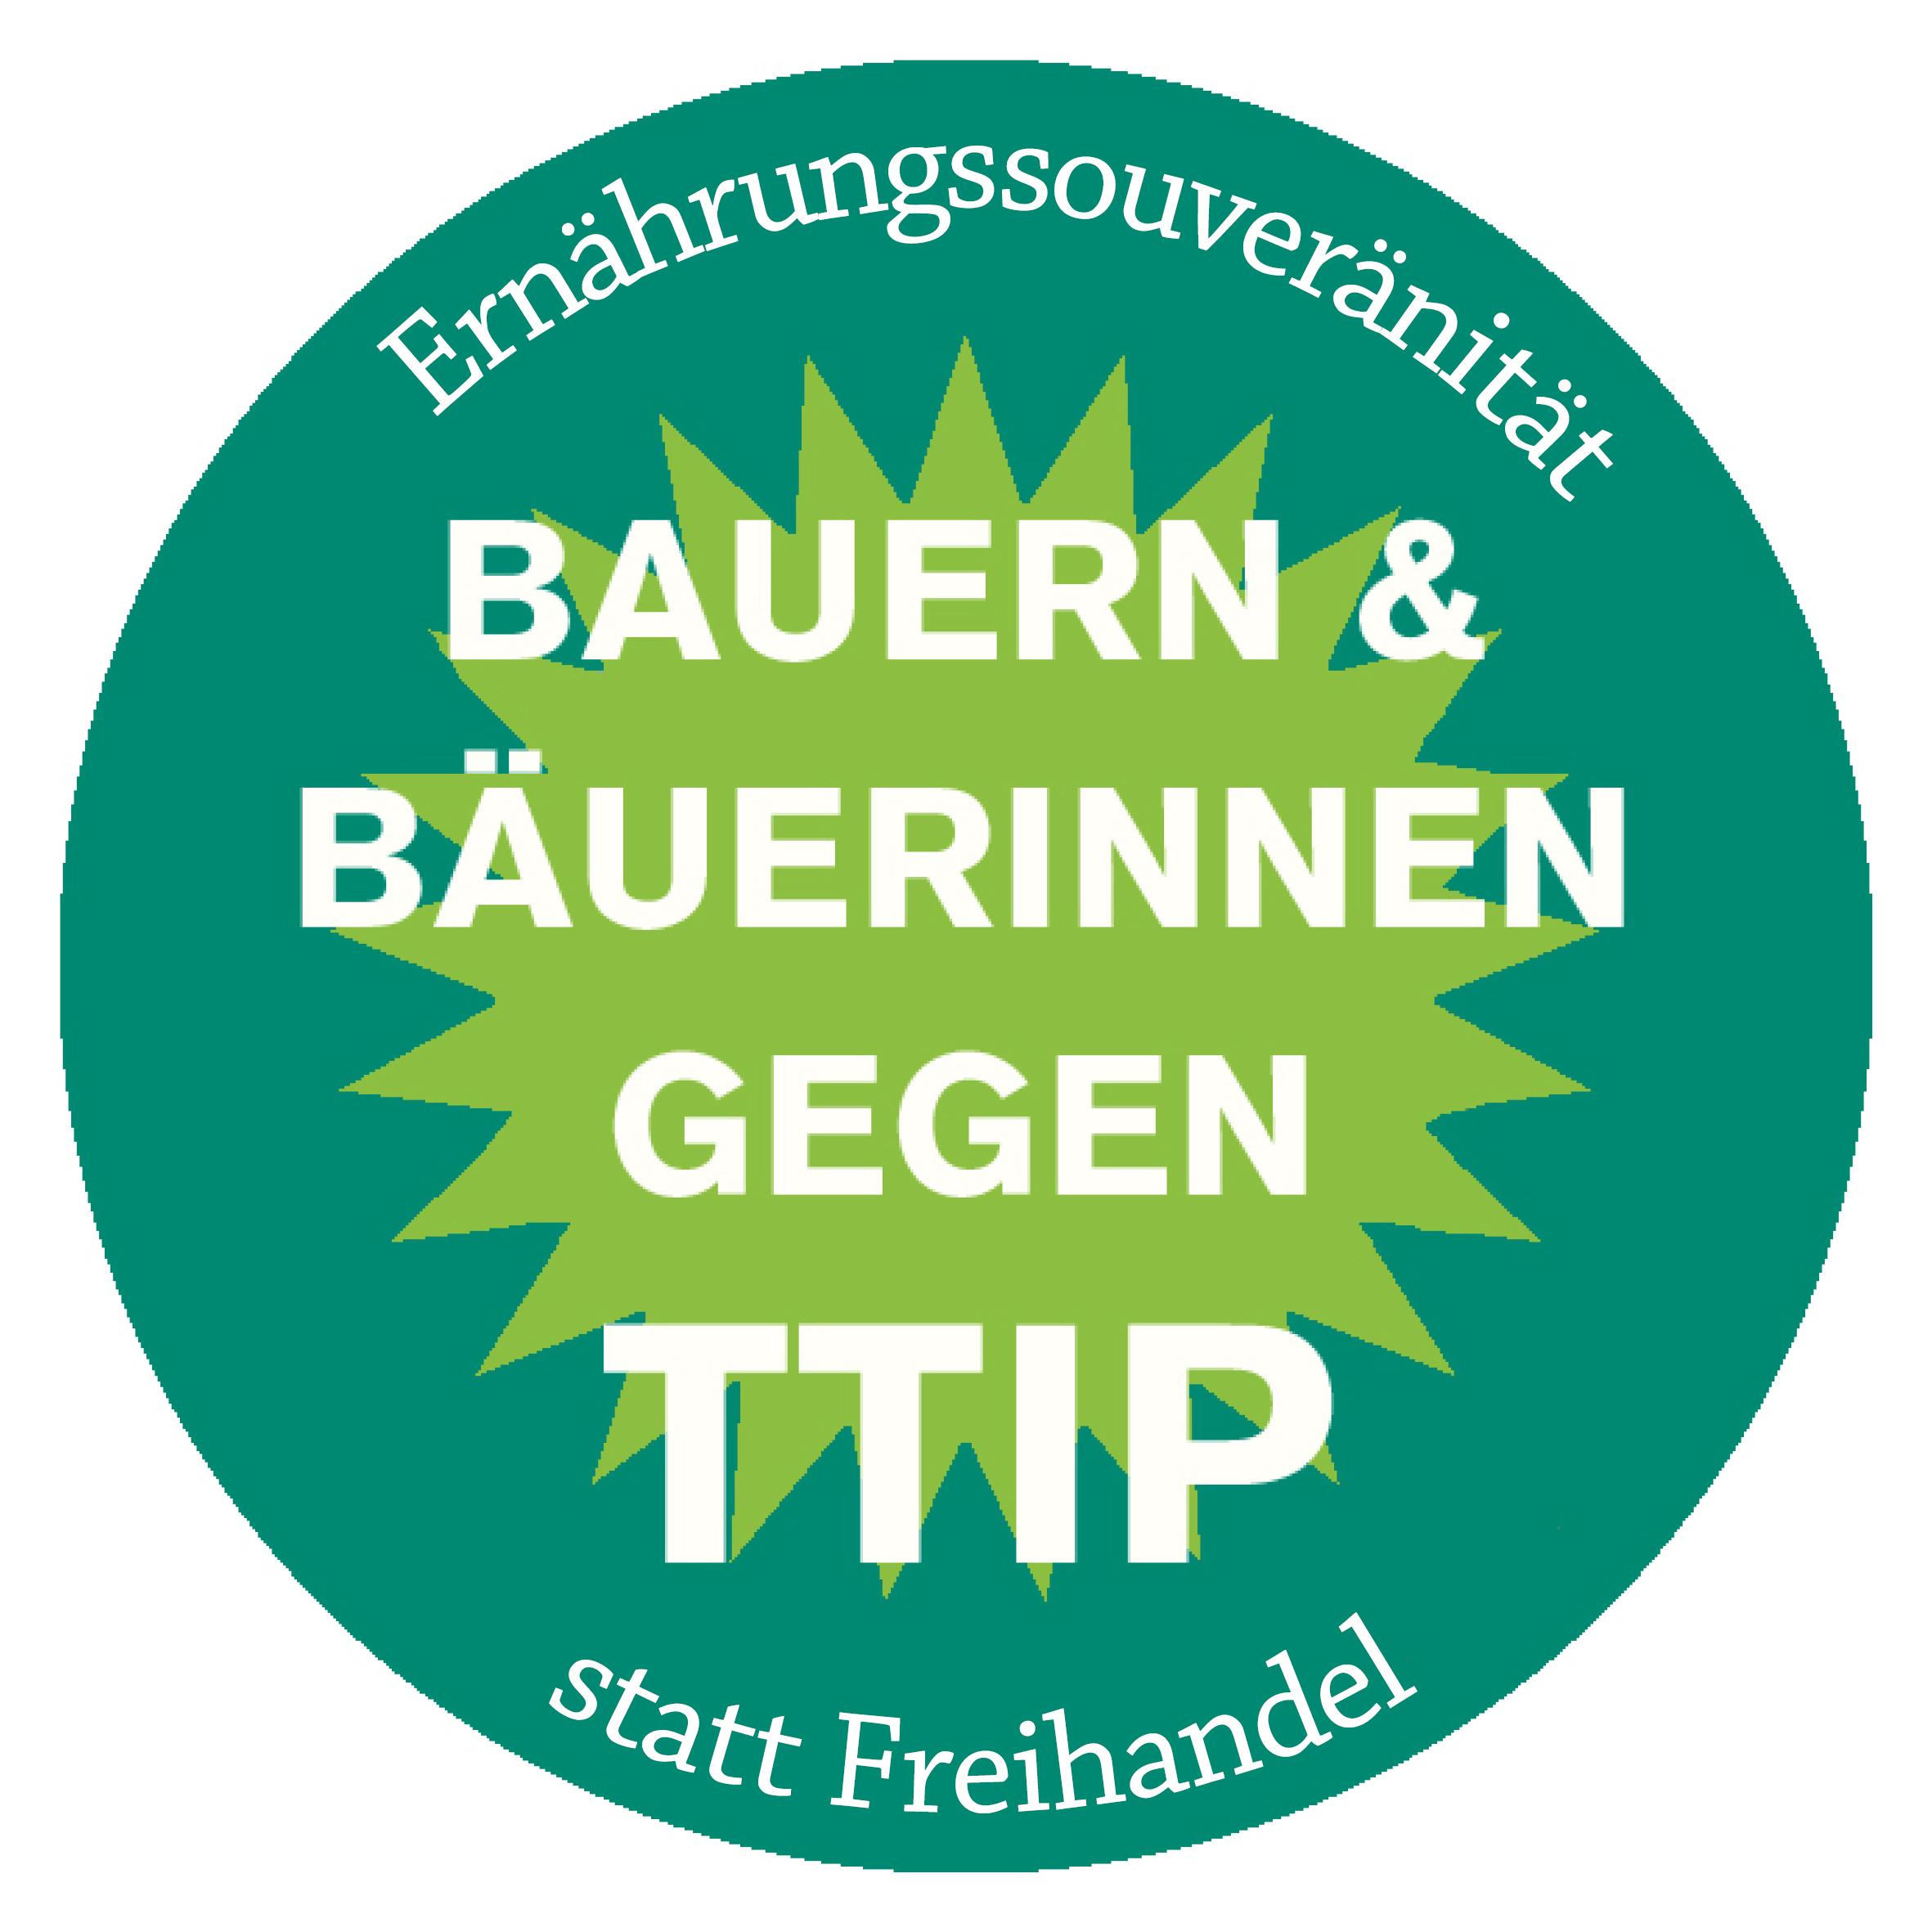 Bauern & Bäuerinnen gegen TTIP